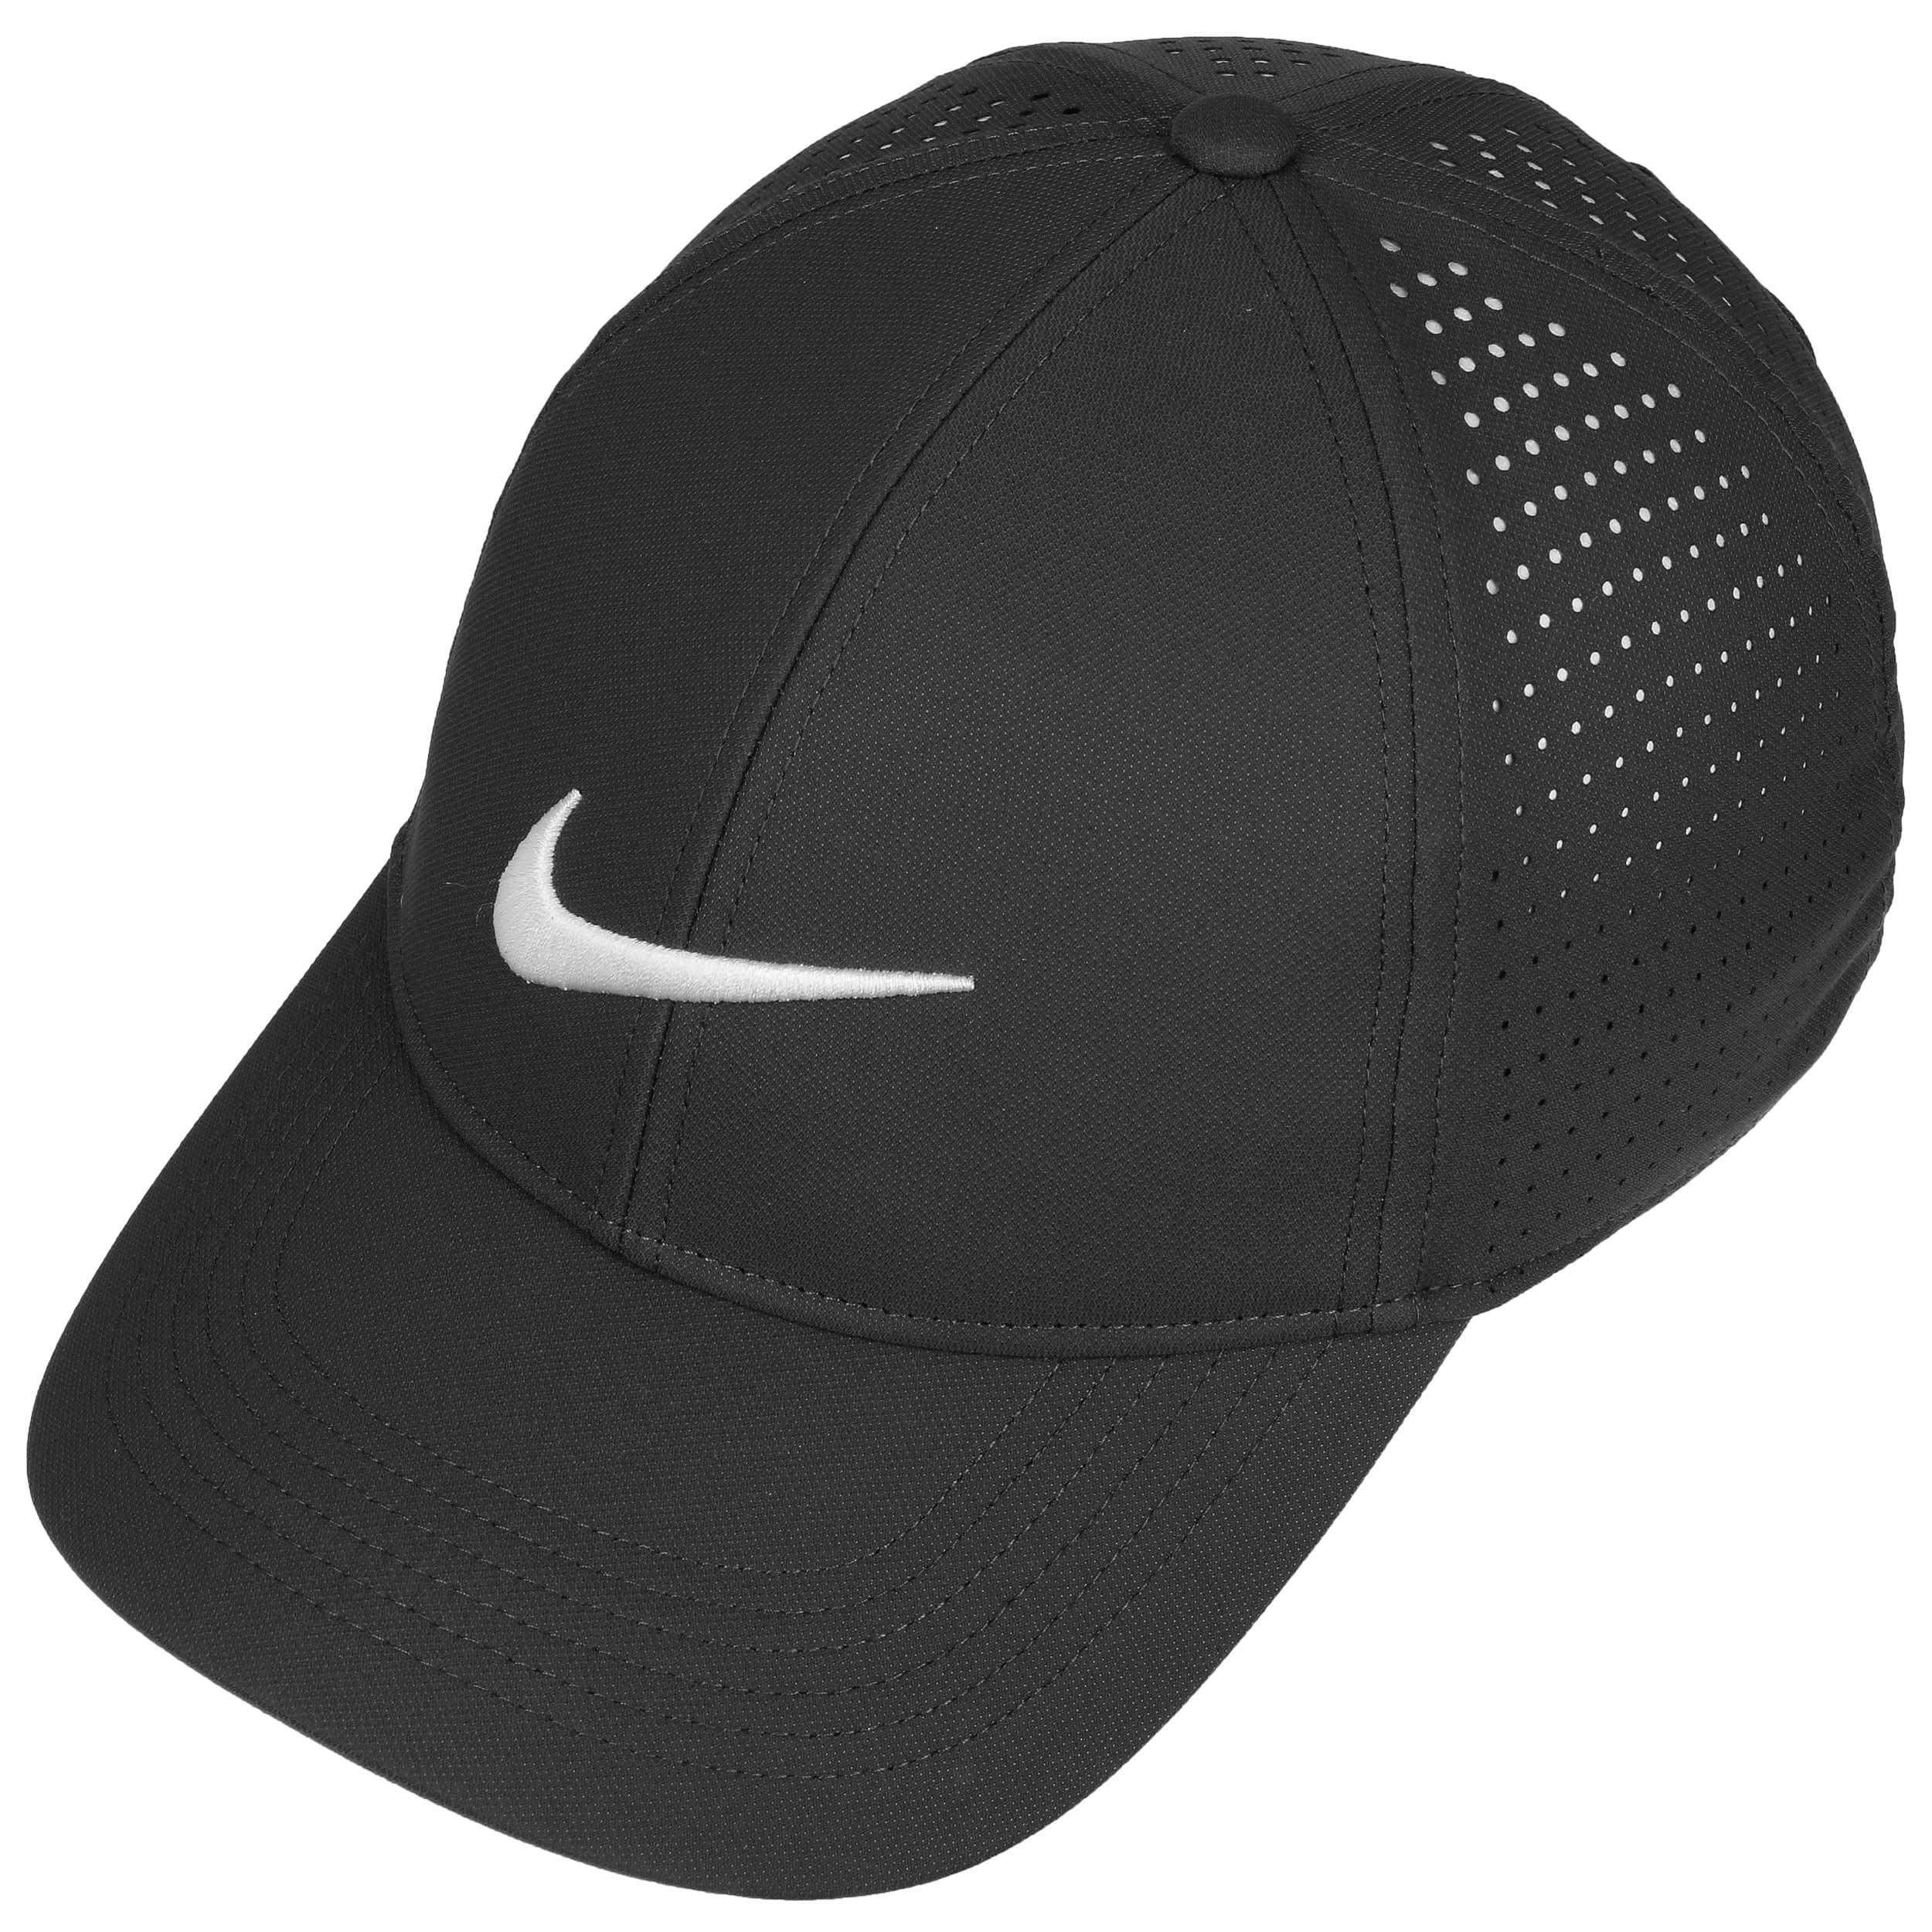 ... Cappellino Legacy 91 Perf by Nike - nero 1 ... 314880d756b6